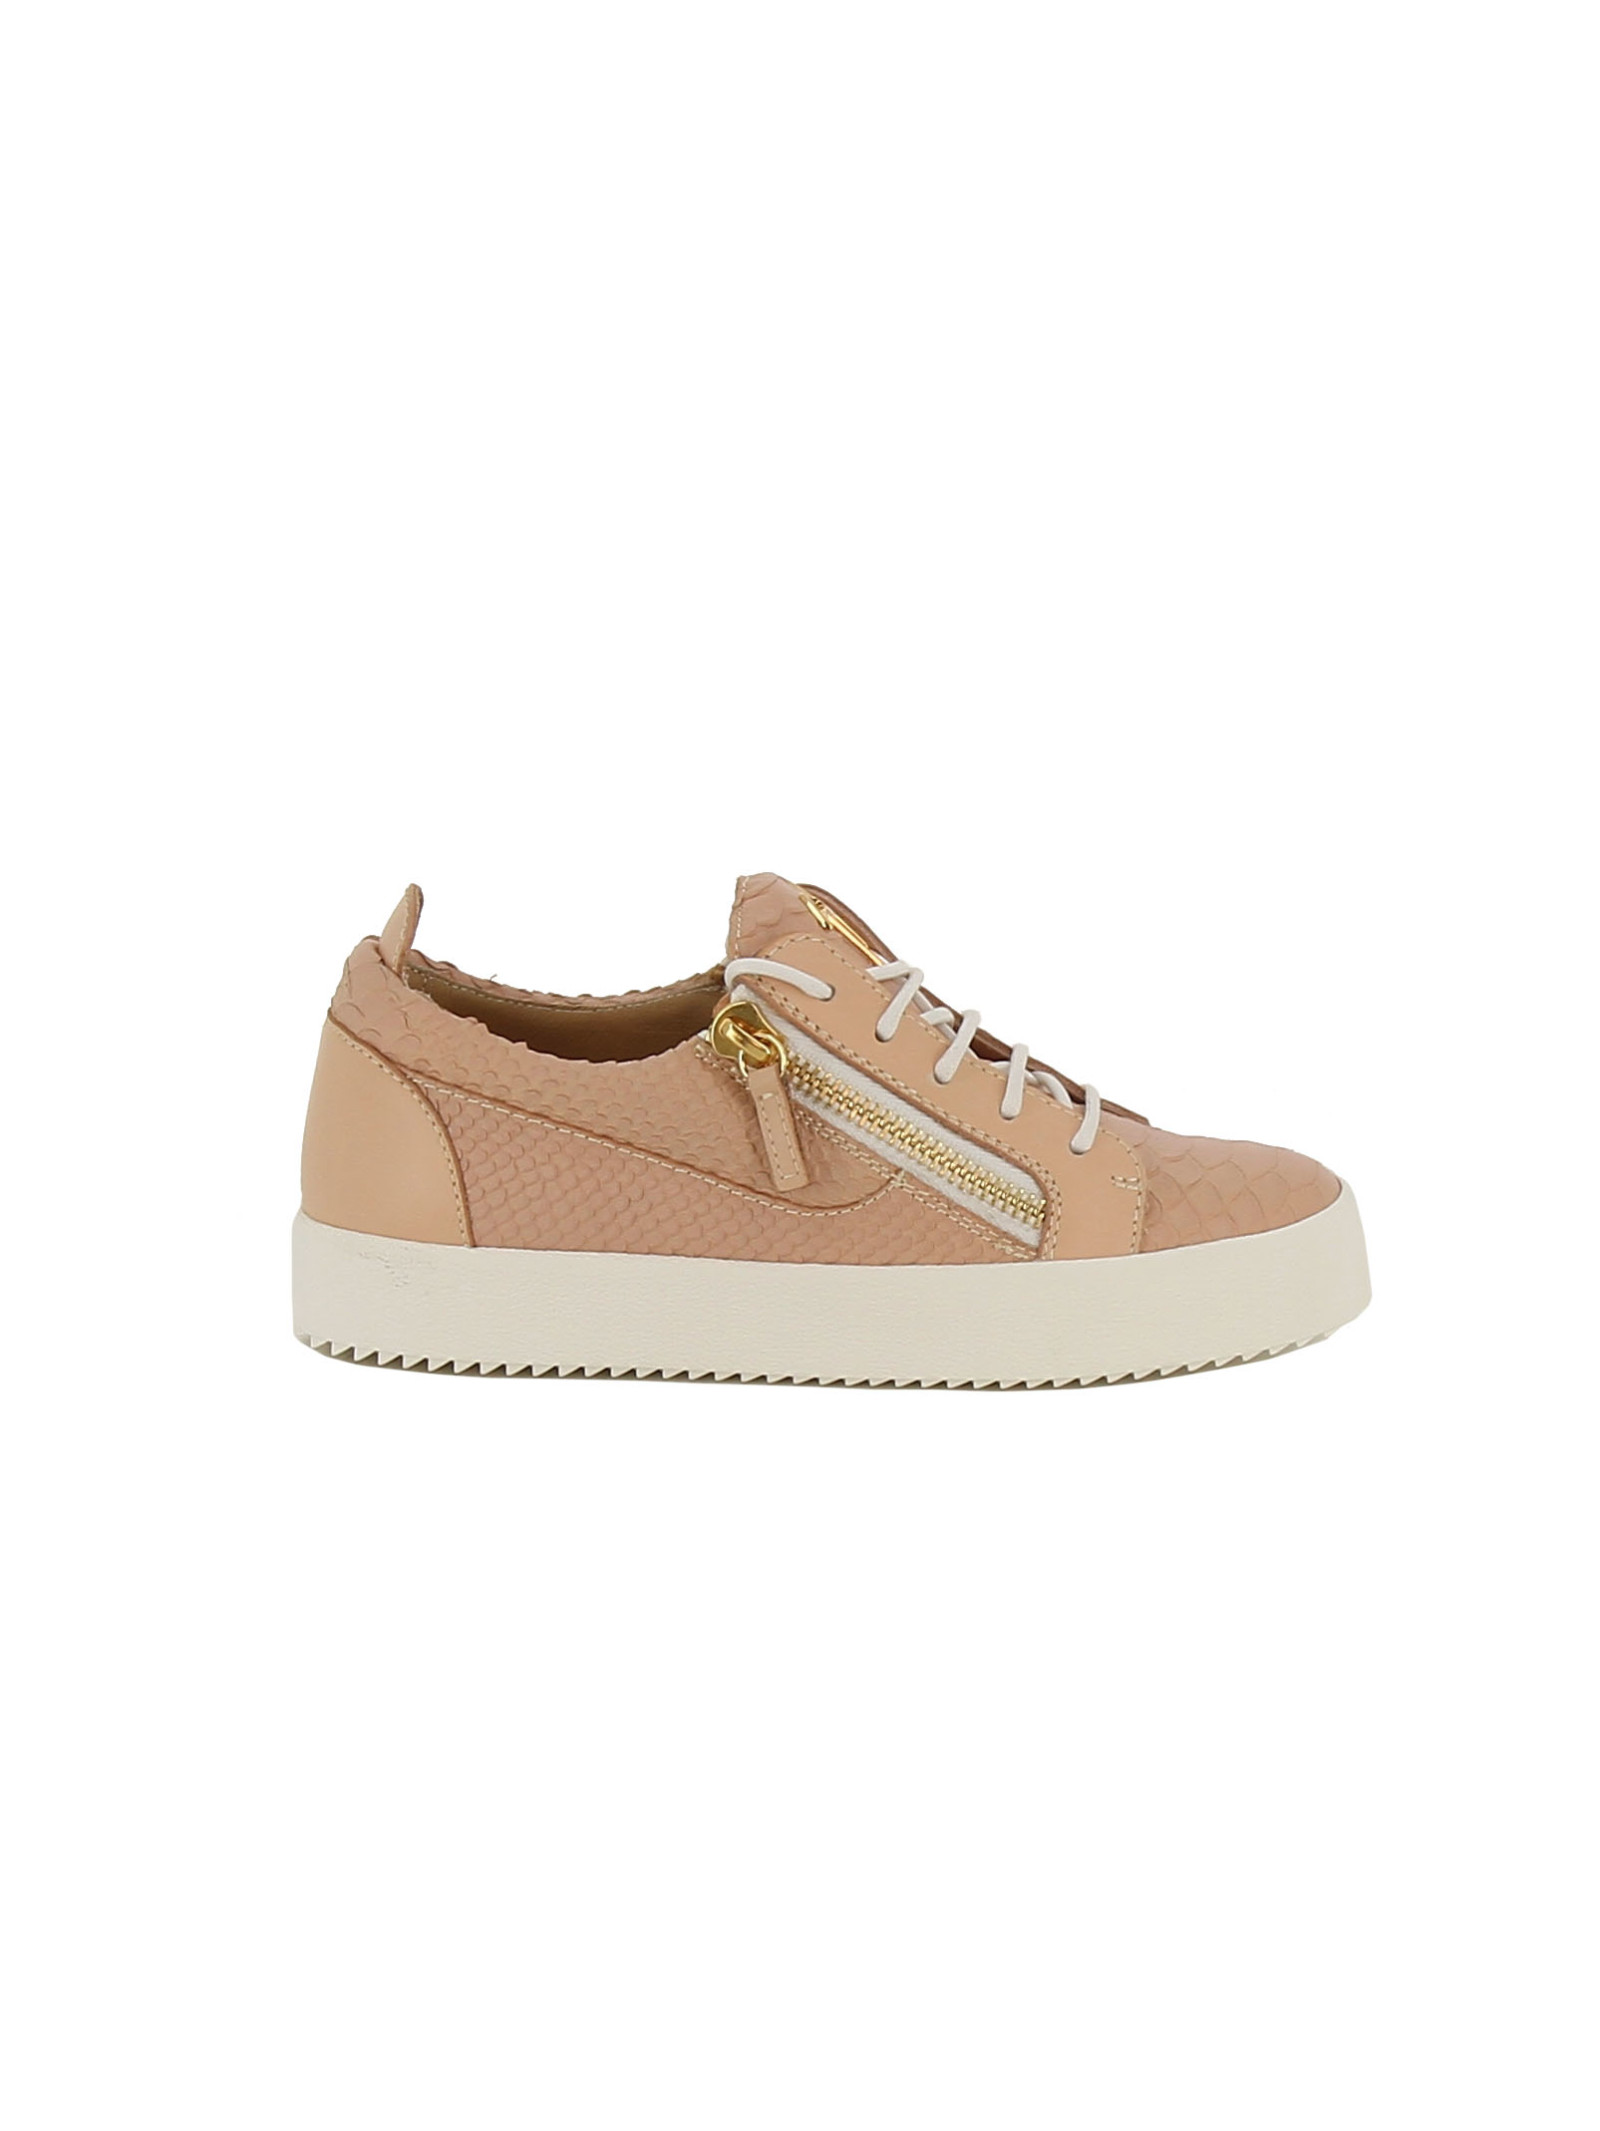 giuseppe zanotti female giuseppe zanotti frankie lowtop sneakers